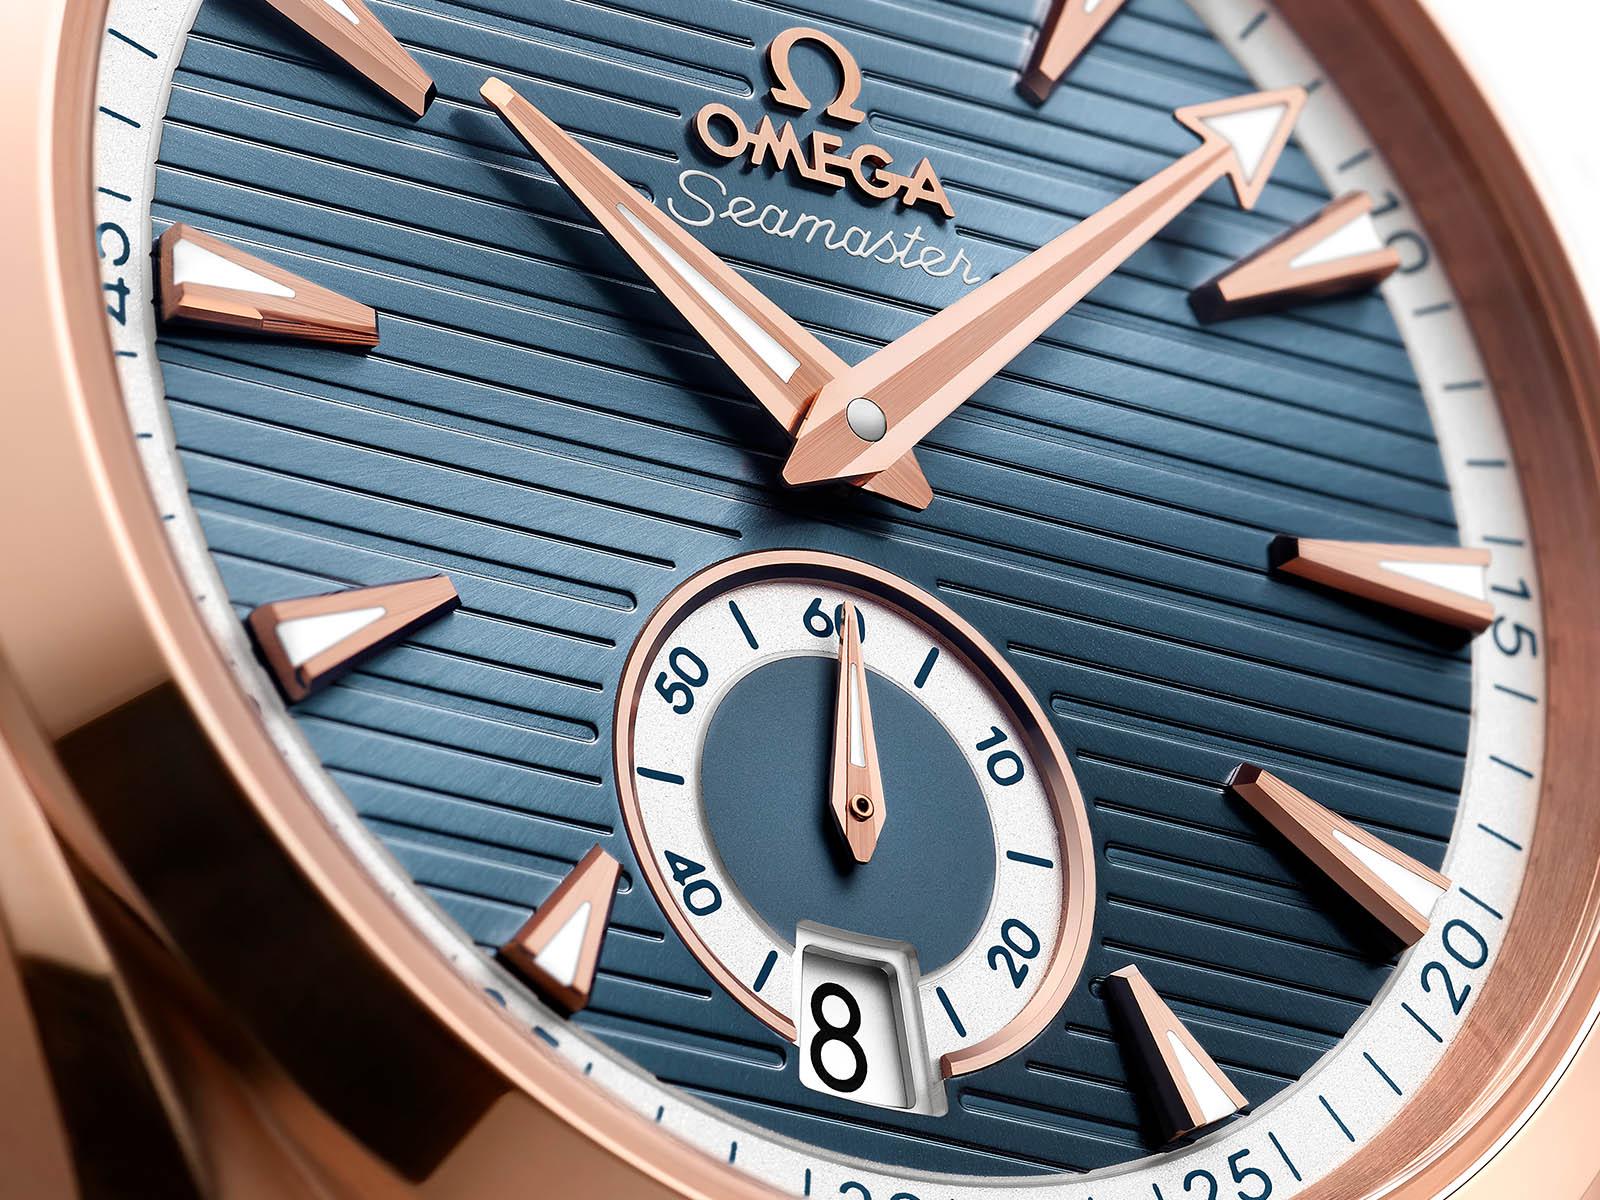 220-50-41-21-03-001-omega-seamaster-aqua-terra-150m-2.jpg